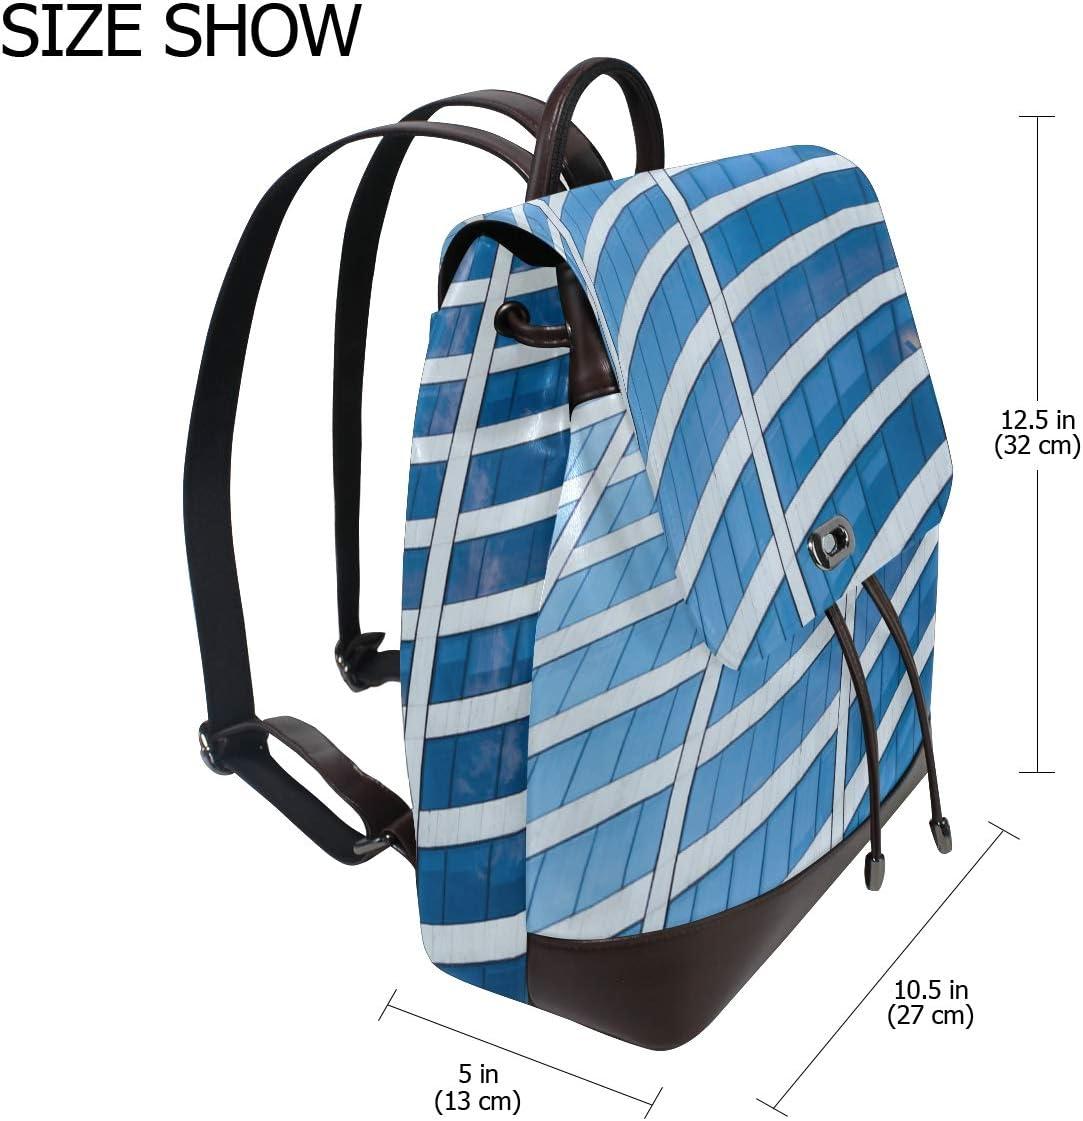 Carrottop Brown Leather Backpack for Women Travel Shoulder Bag for Elegant Ladies New York Blue